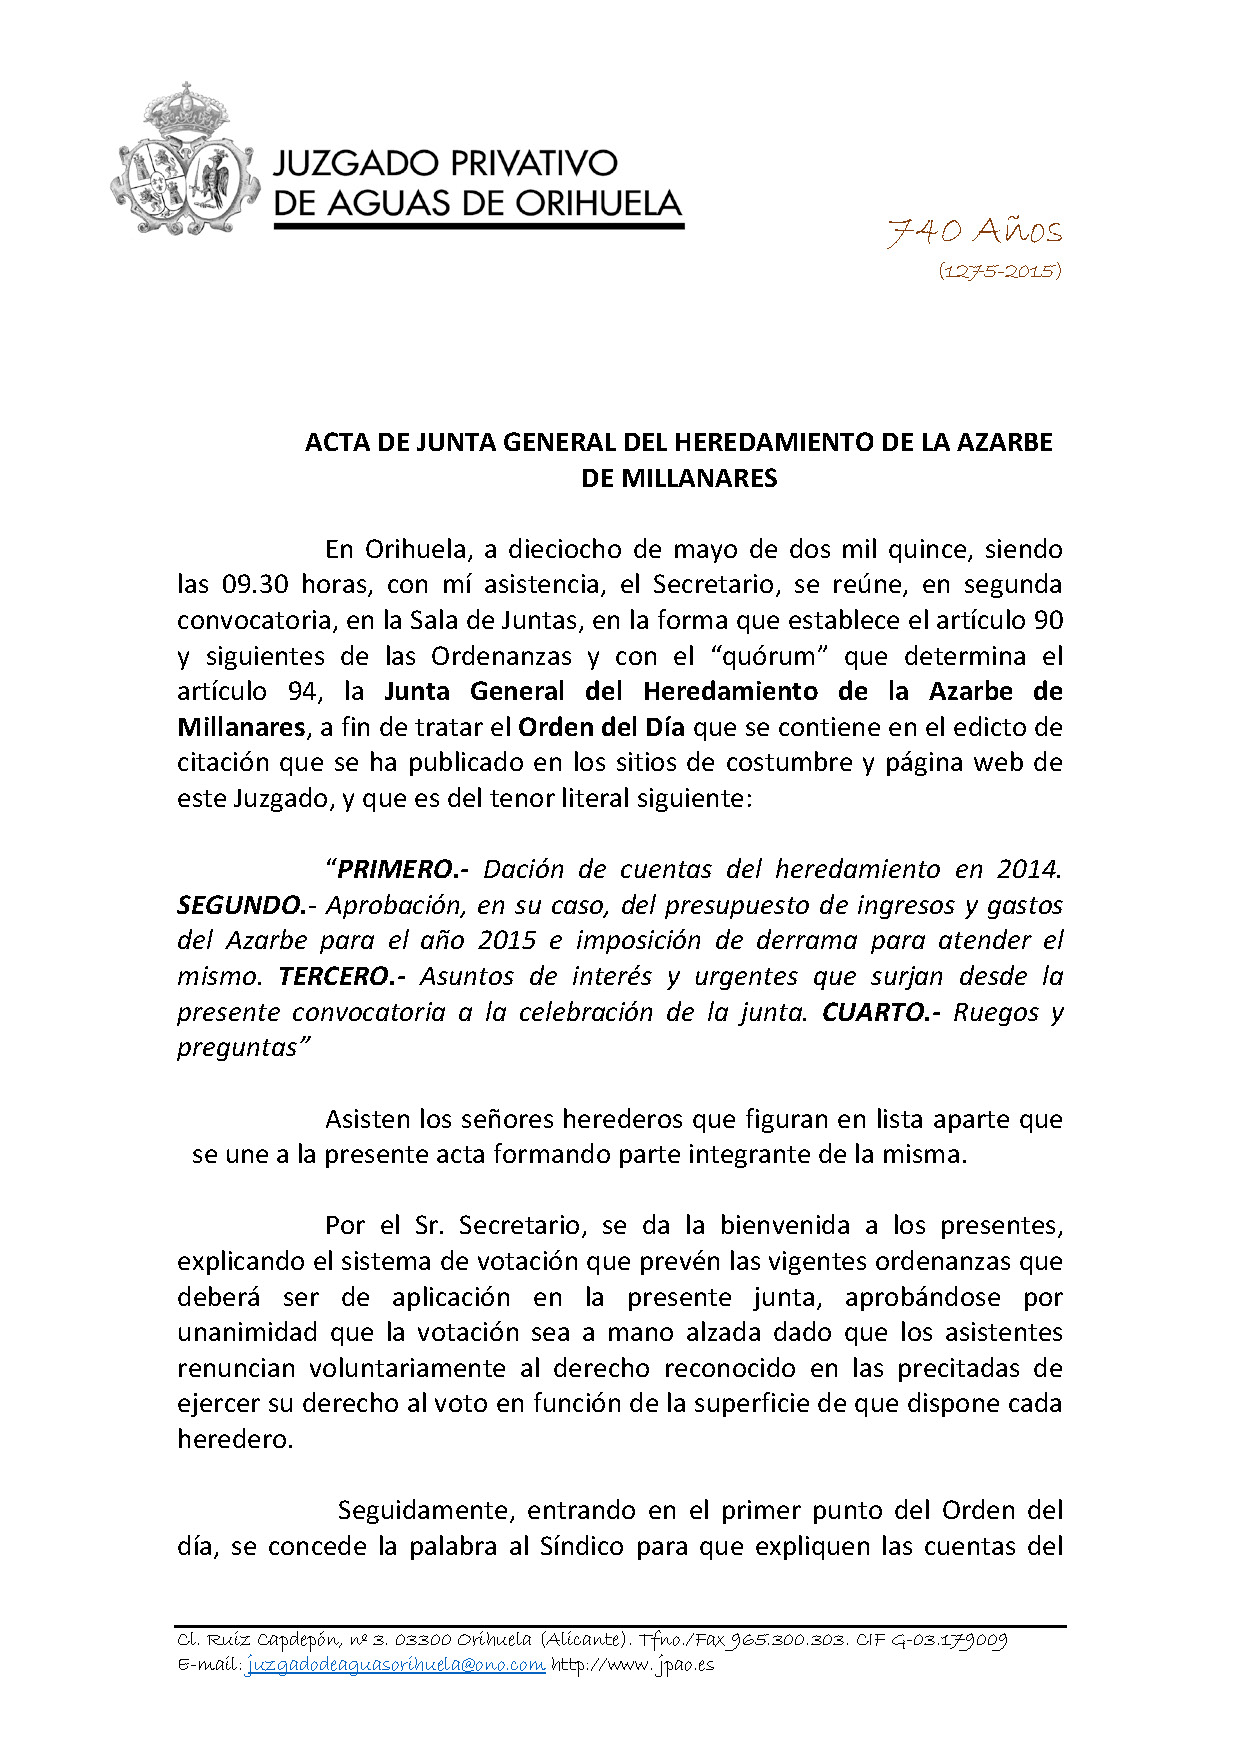 58 2015 AZARBE DE MILLANARES  ACTA ASAMBLEA GENERAL 18052015_Página_1